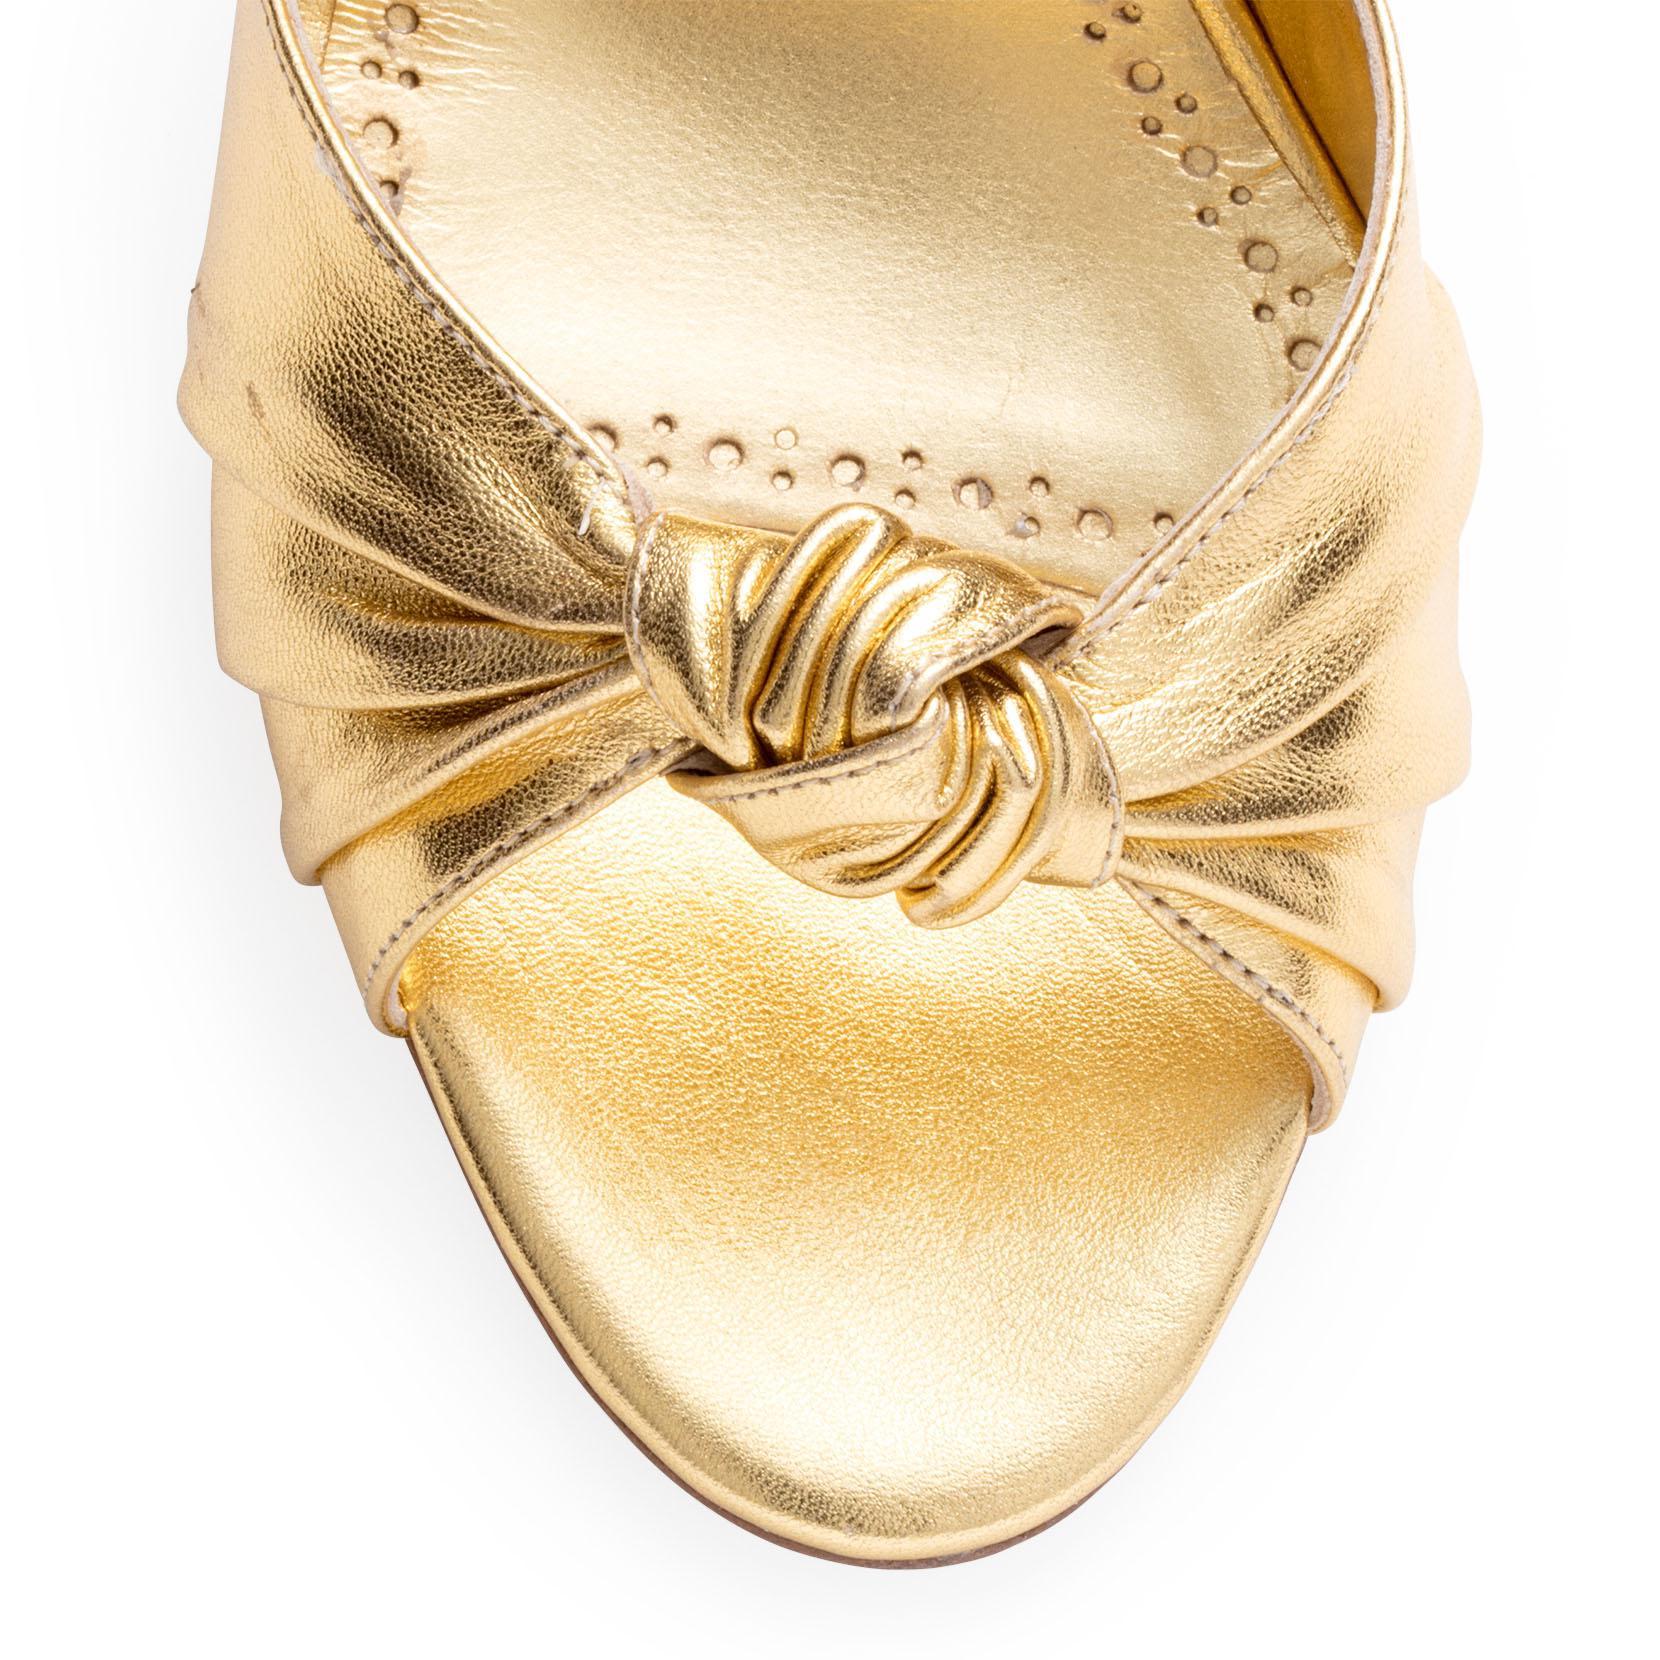 Mumuyesli 70 nappa light gold sandal Manolo Blahnik 8ux9lmAg